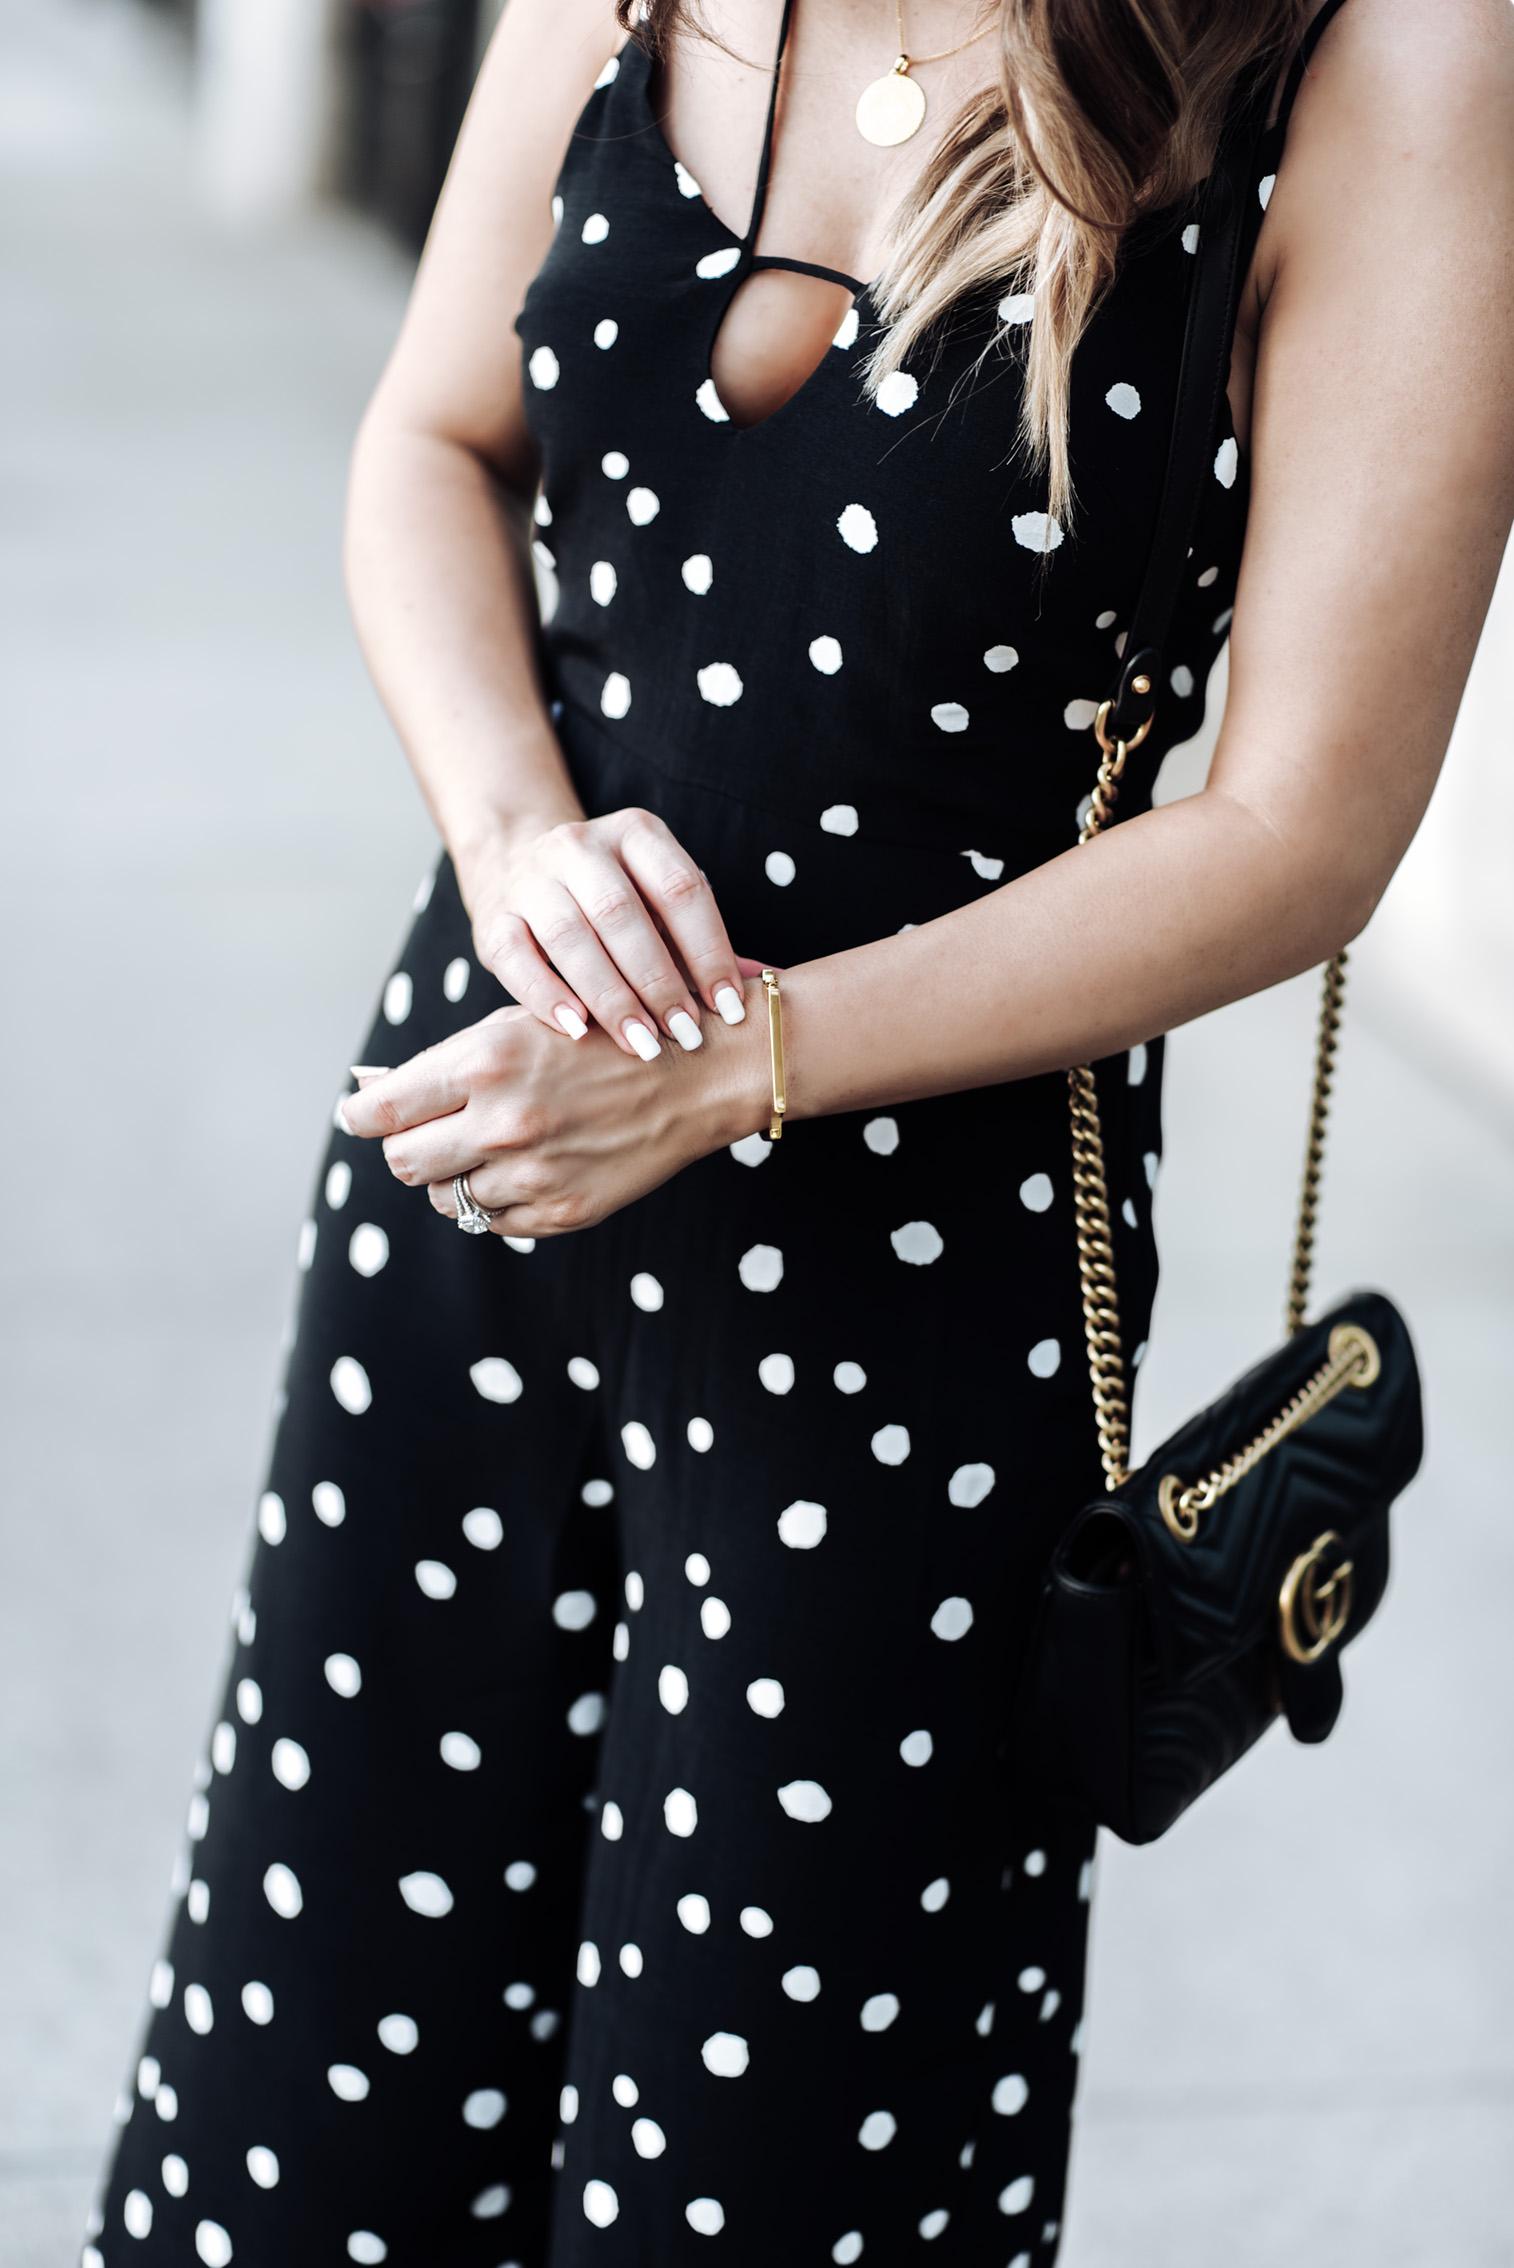 Tiffany Jais Houston fashion and lifestyle blogger | Polka dot jumpsuit from Nordstrom| Gucci Marmot, Mini Marie Pendant, Signature large bangle, Carrson Sandal, Streetstyle blogger